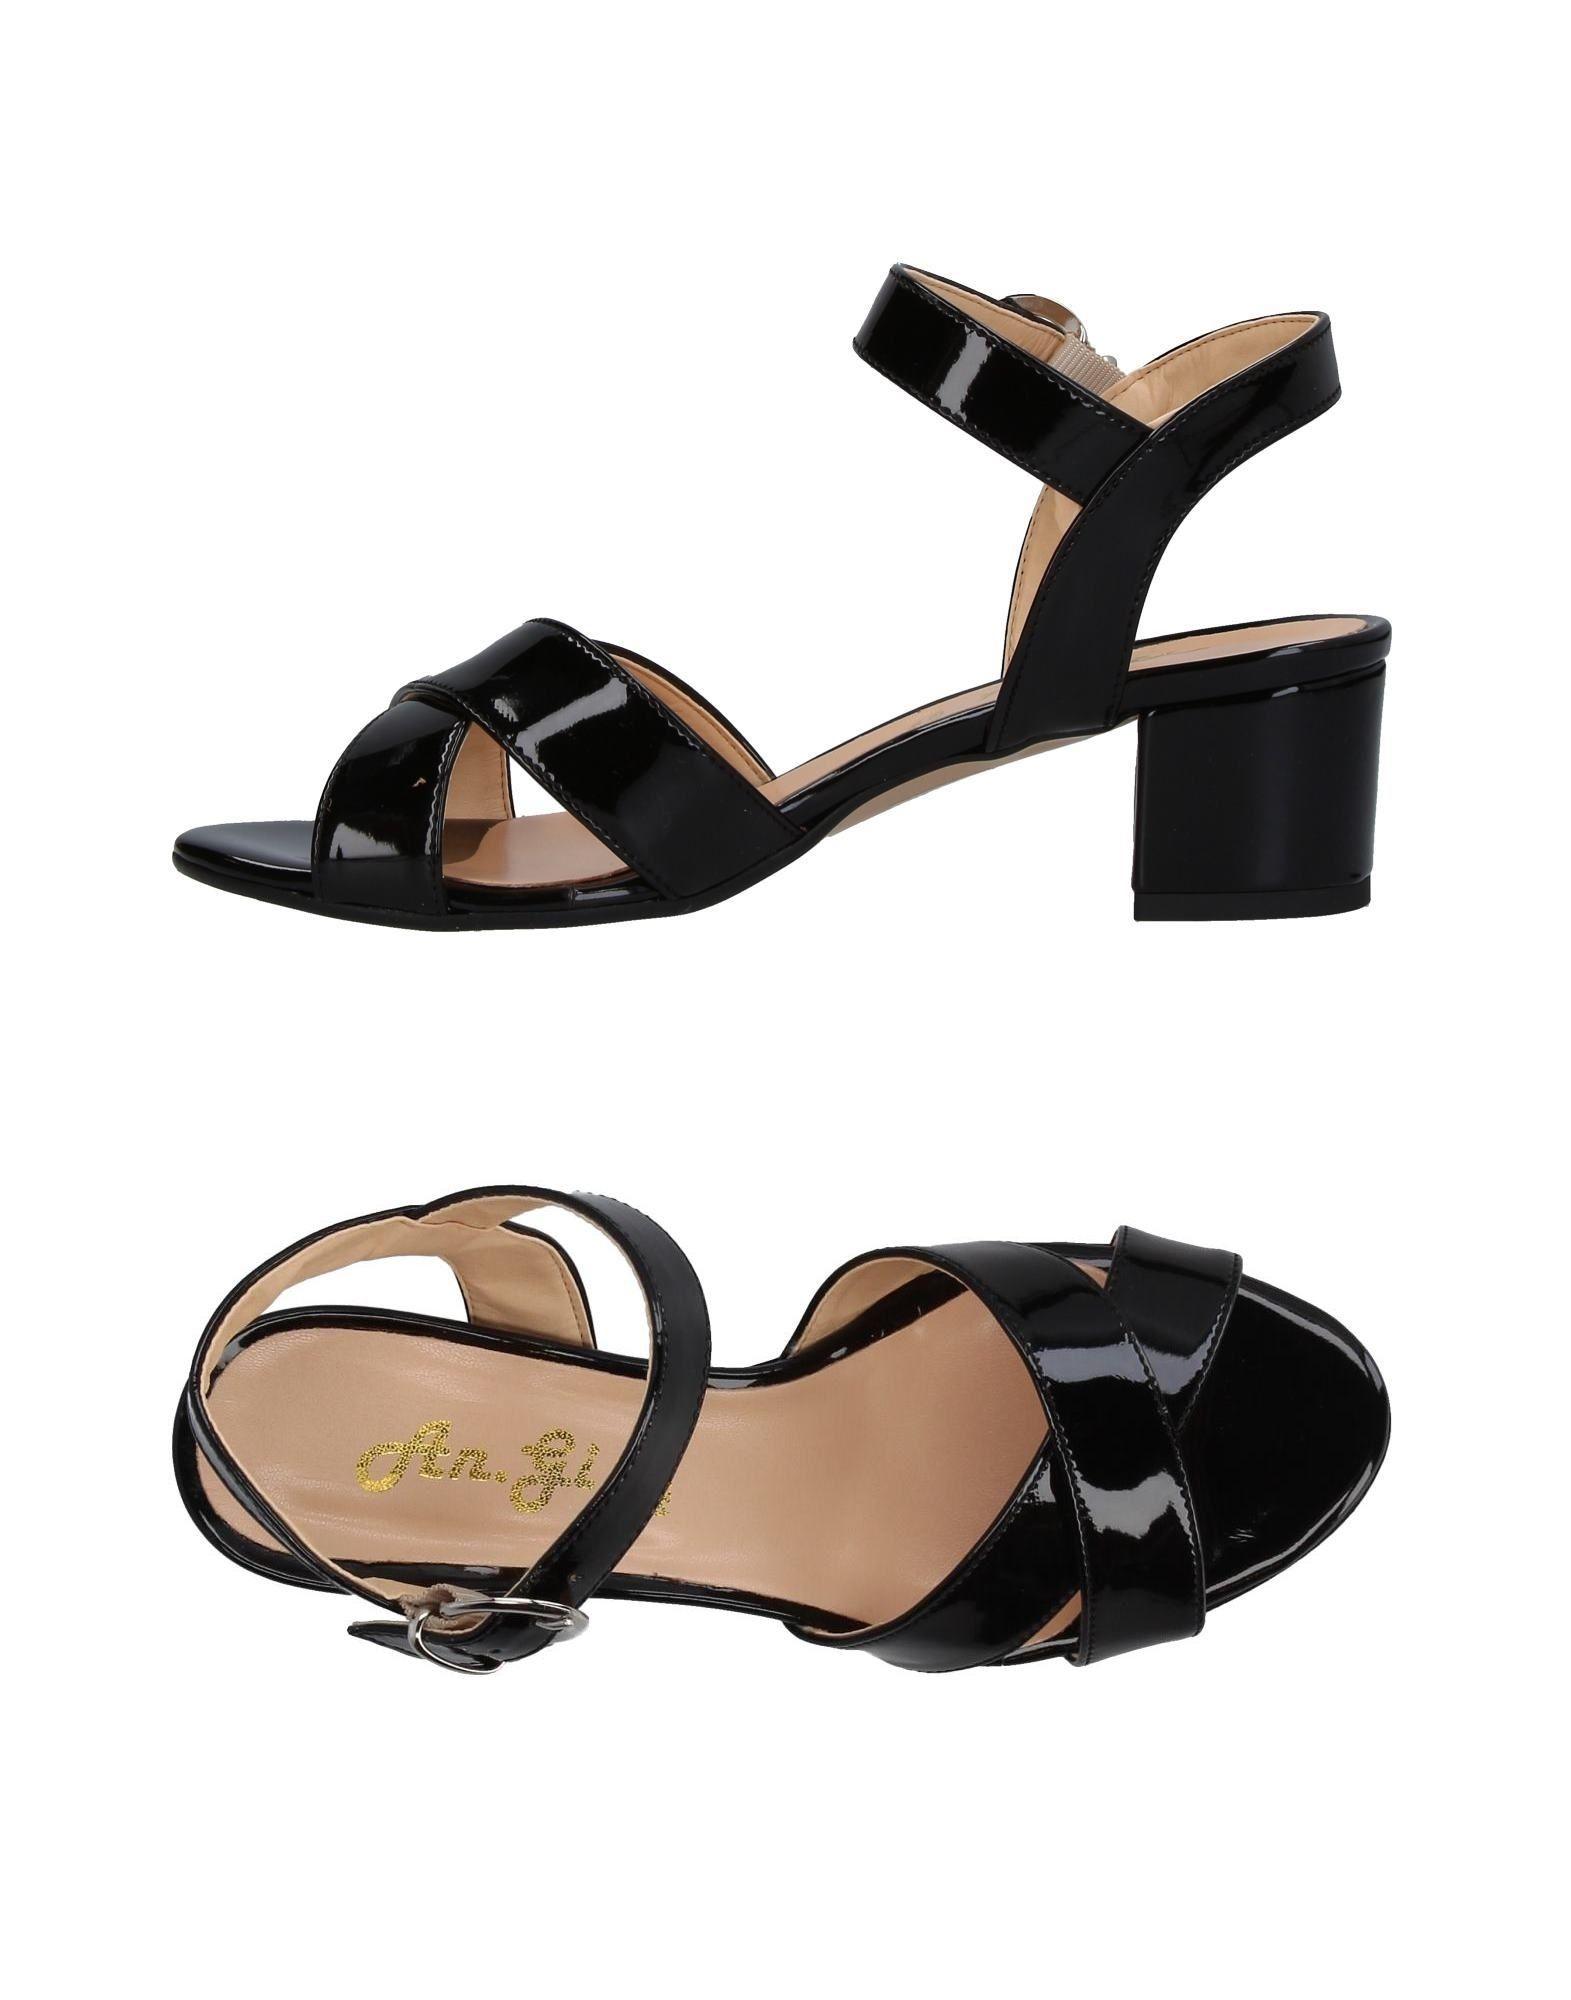 AN.GI Damen Sandale Farbe Schwarz Größe 9